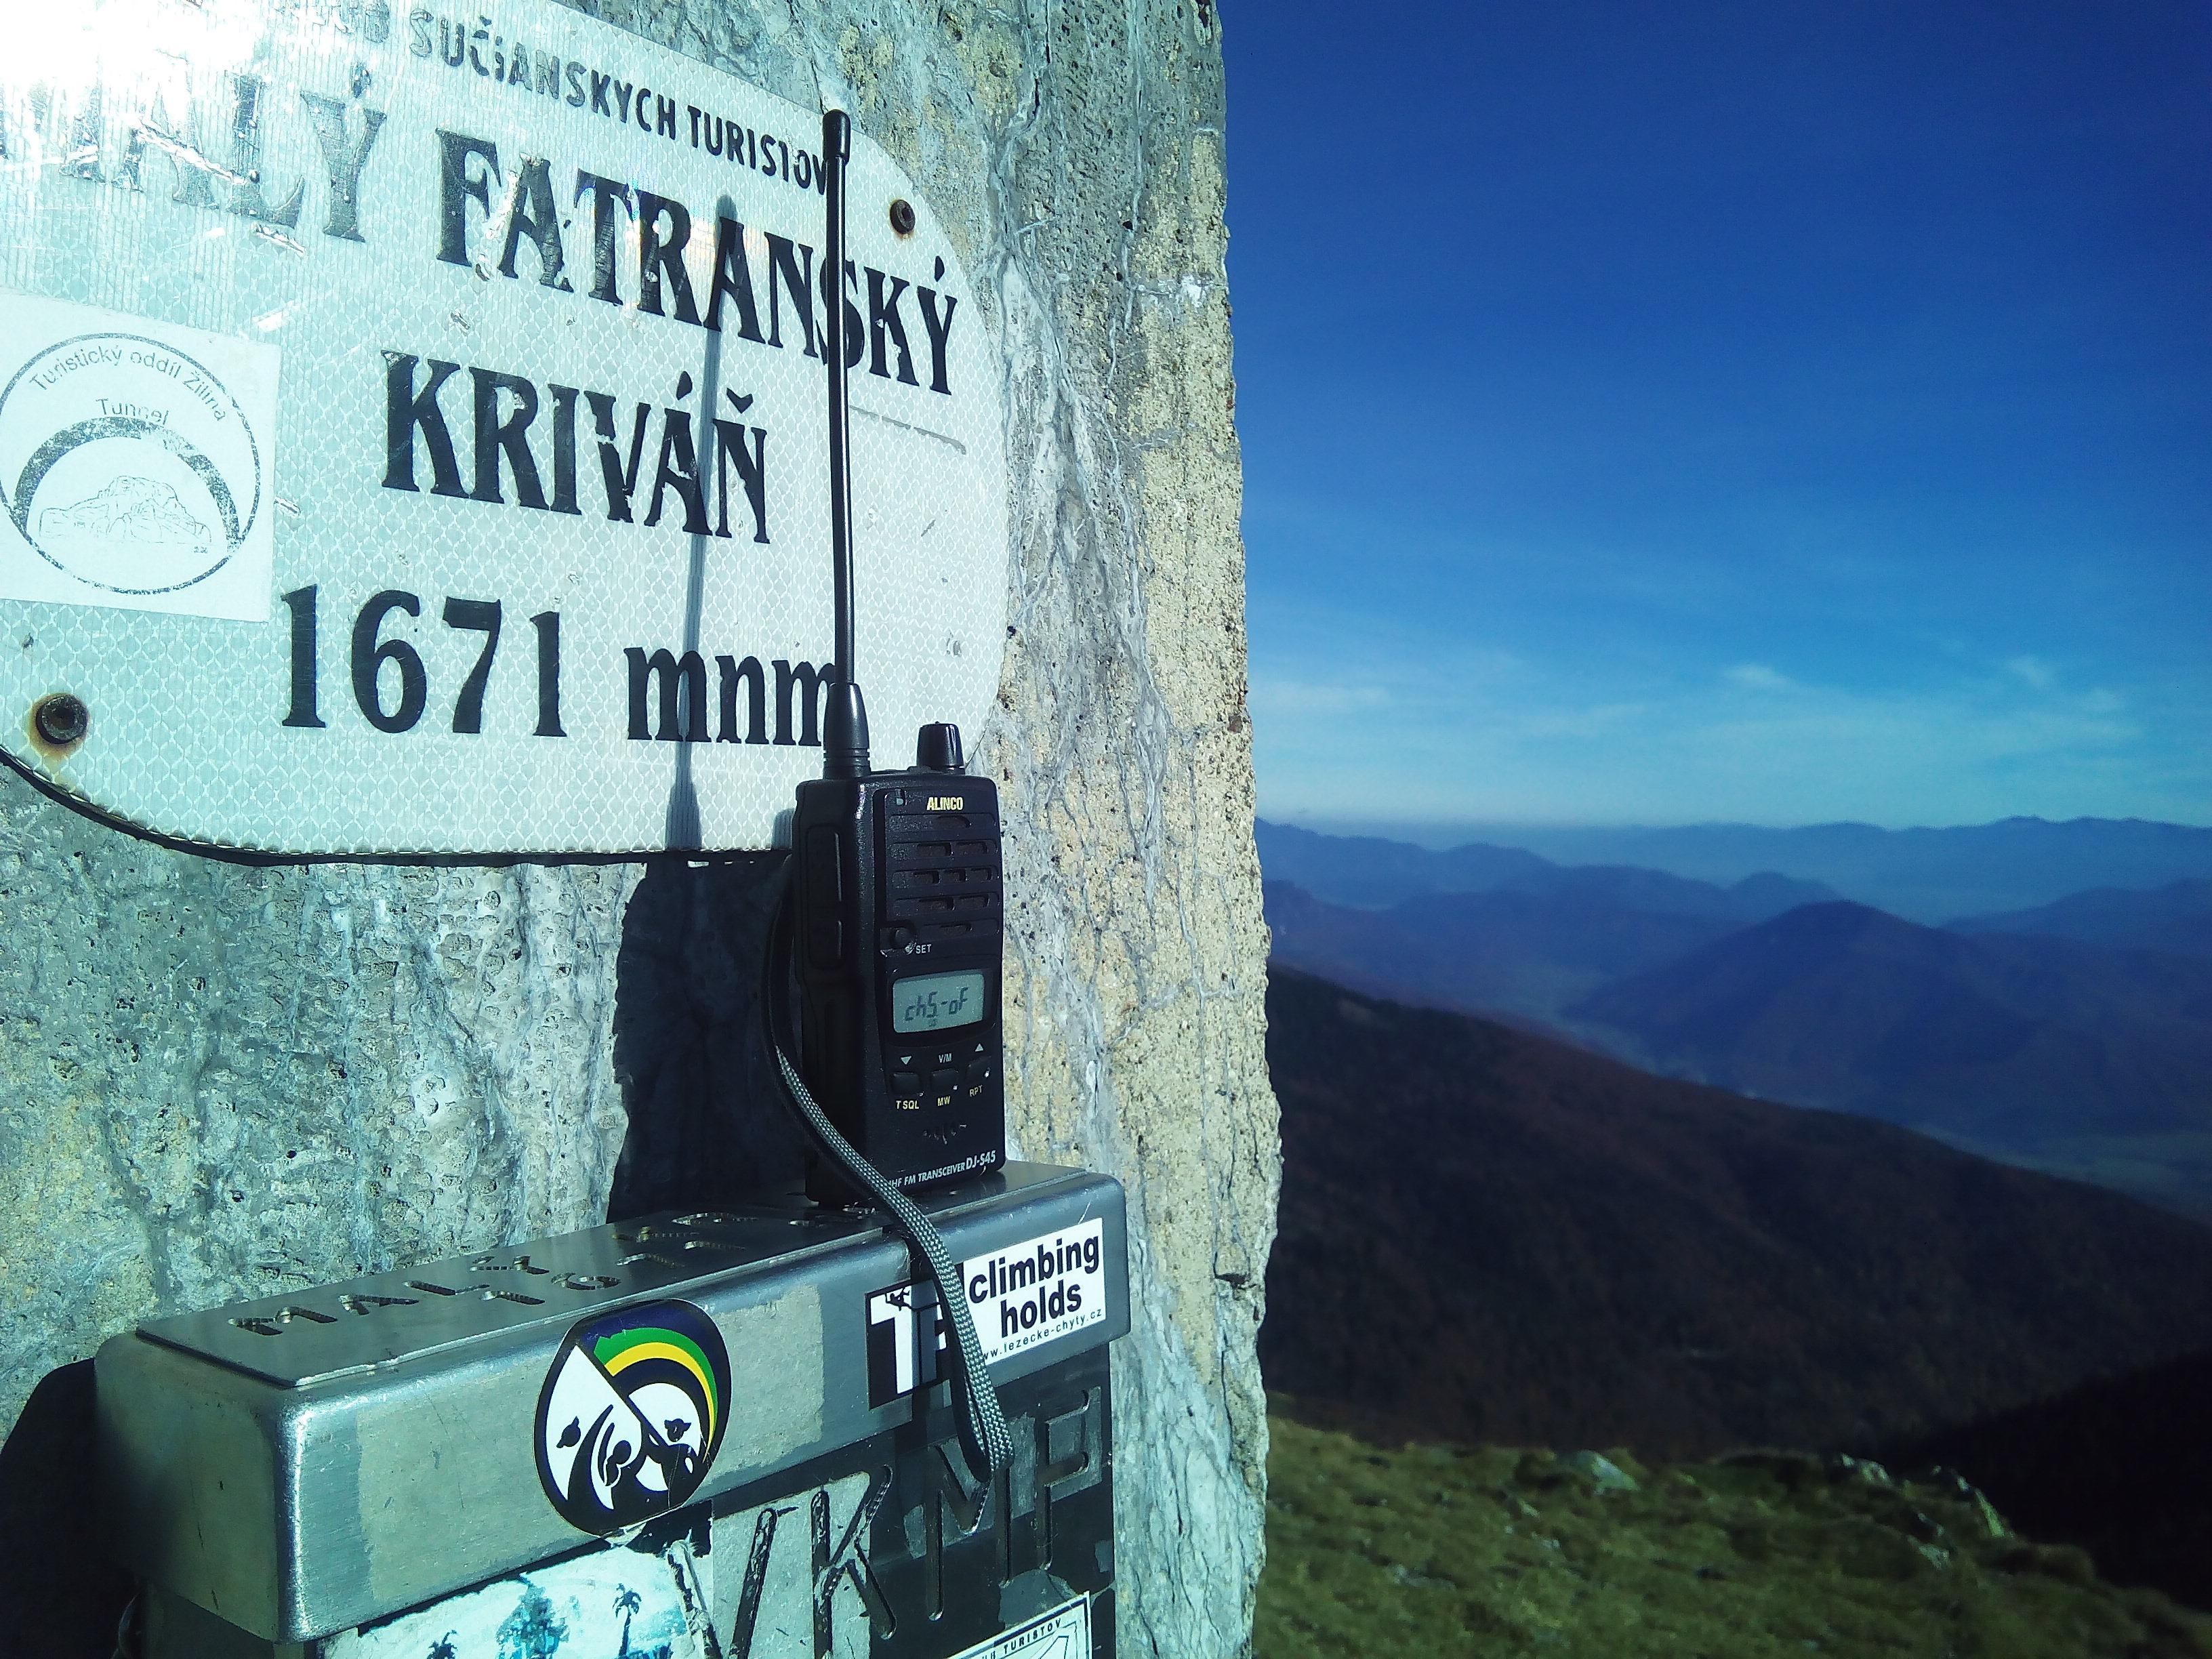 Maly Krivan vzdaleny pres 300 km